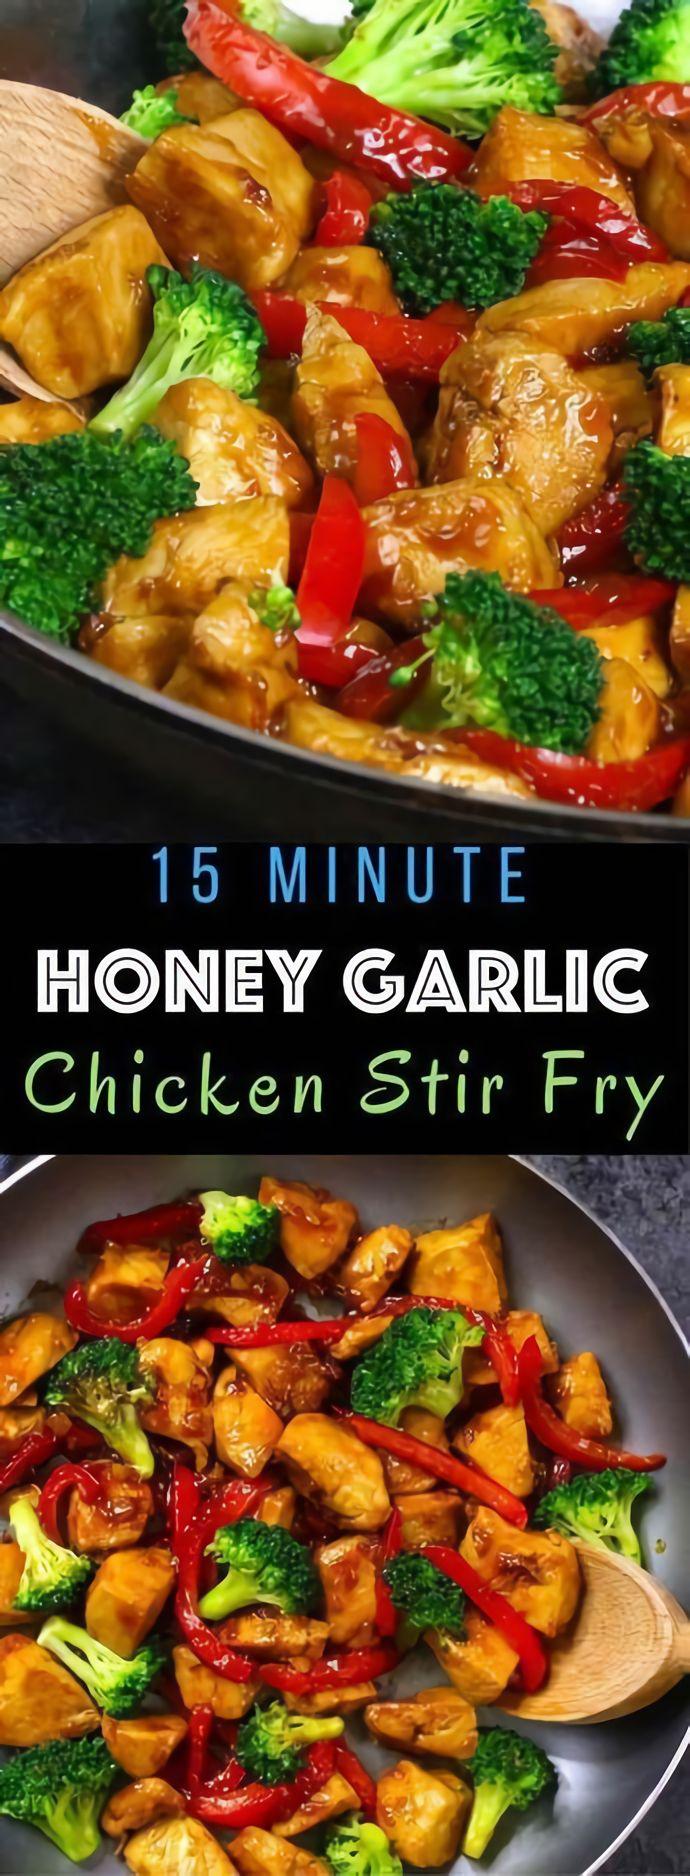 Honey Garlic Chicken Stir Fry #Chicken #Garlic